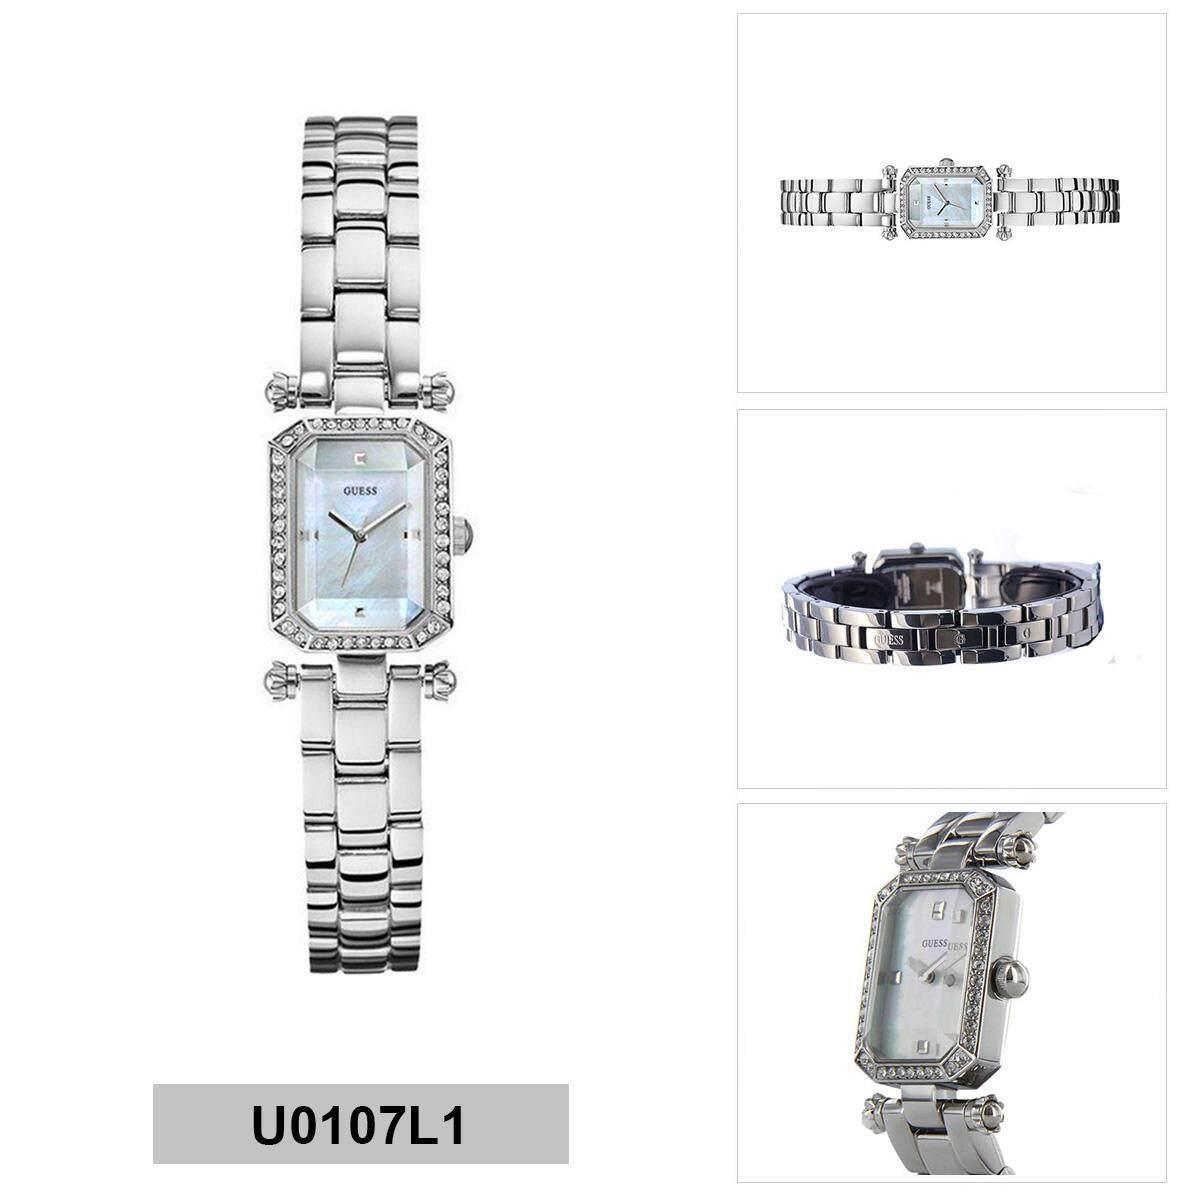 Guess W0632l1 Shimmer Jam Tangan Wanita Silver Diamond Krystal Mini Sunrise W0623l1 Original Rectangular Stainless Steel Case Bracelet Ladies U0107l1